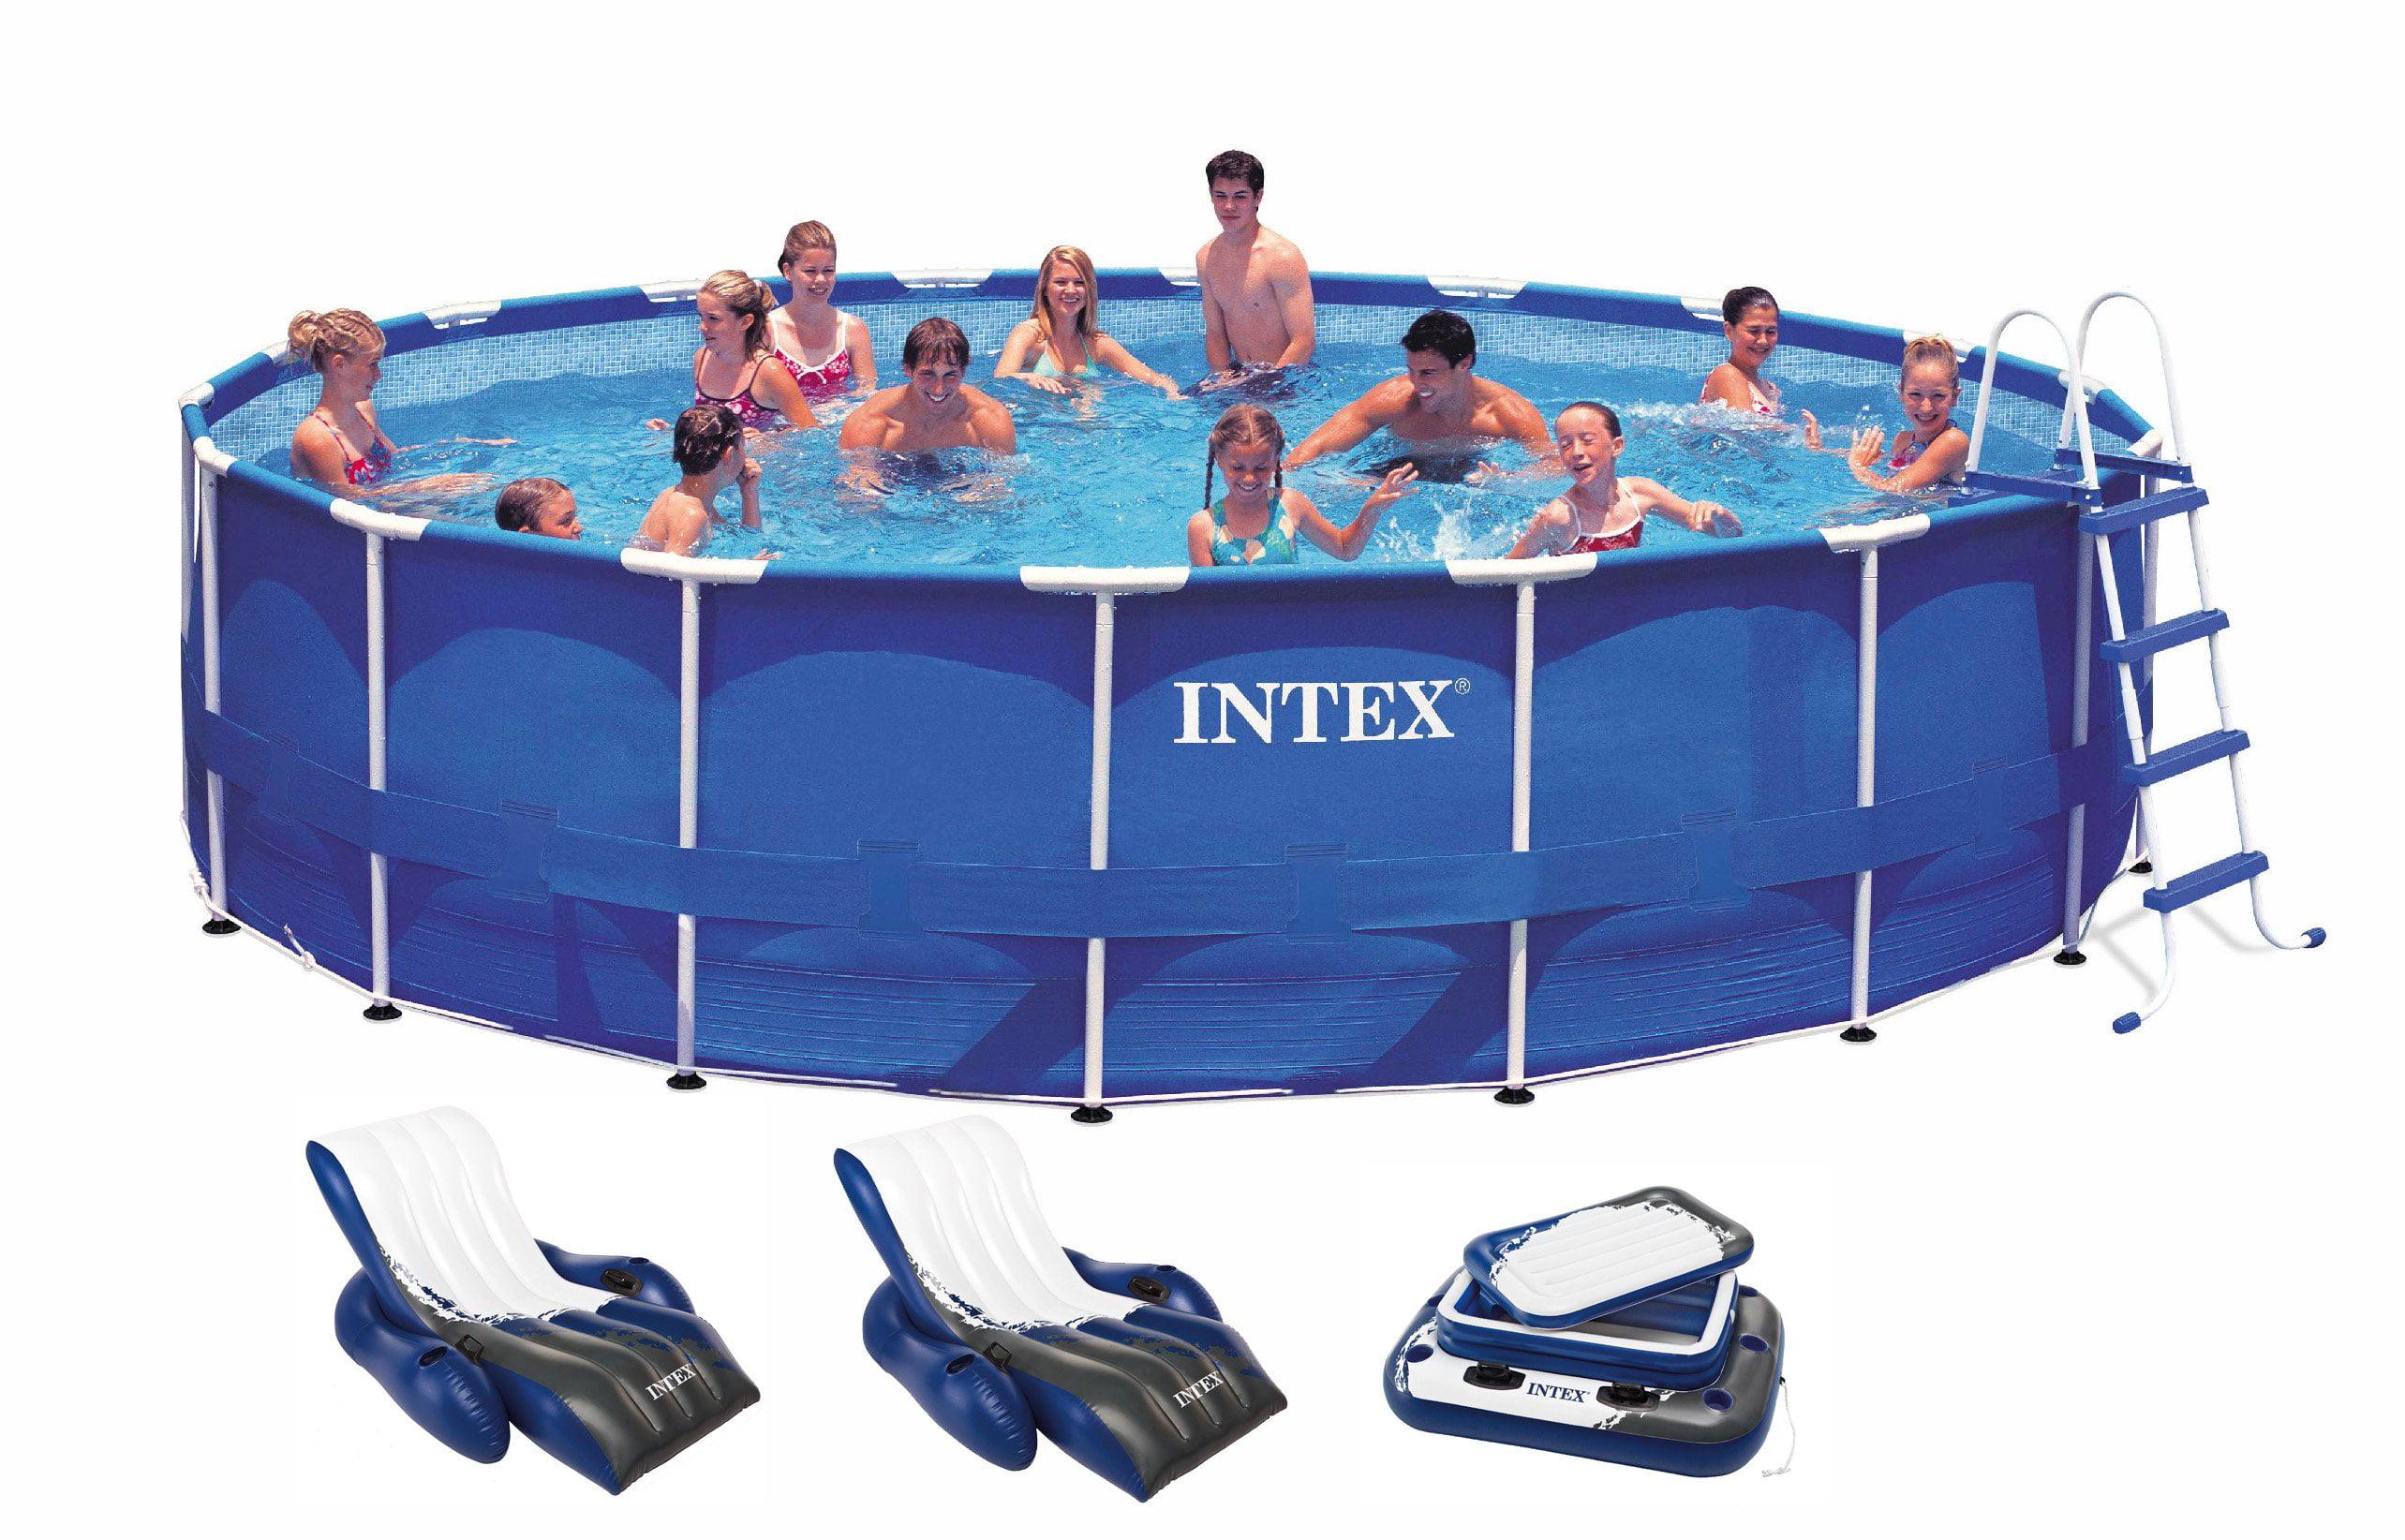 "Intex 18' x 48"" Metal Frame Swimming Pool Deluxe Set w  1500 GFCI Pump | 28251EH by Intex"